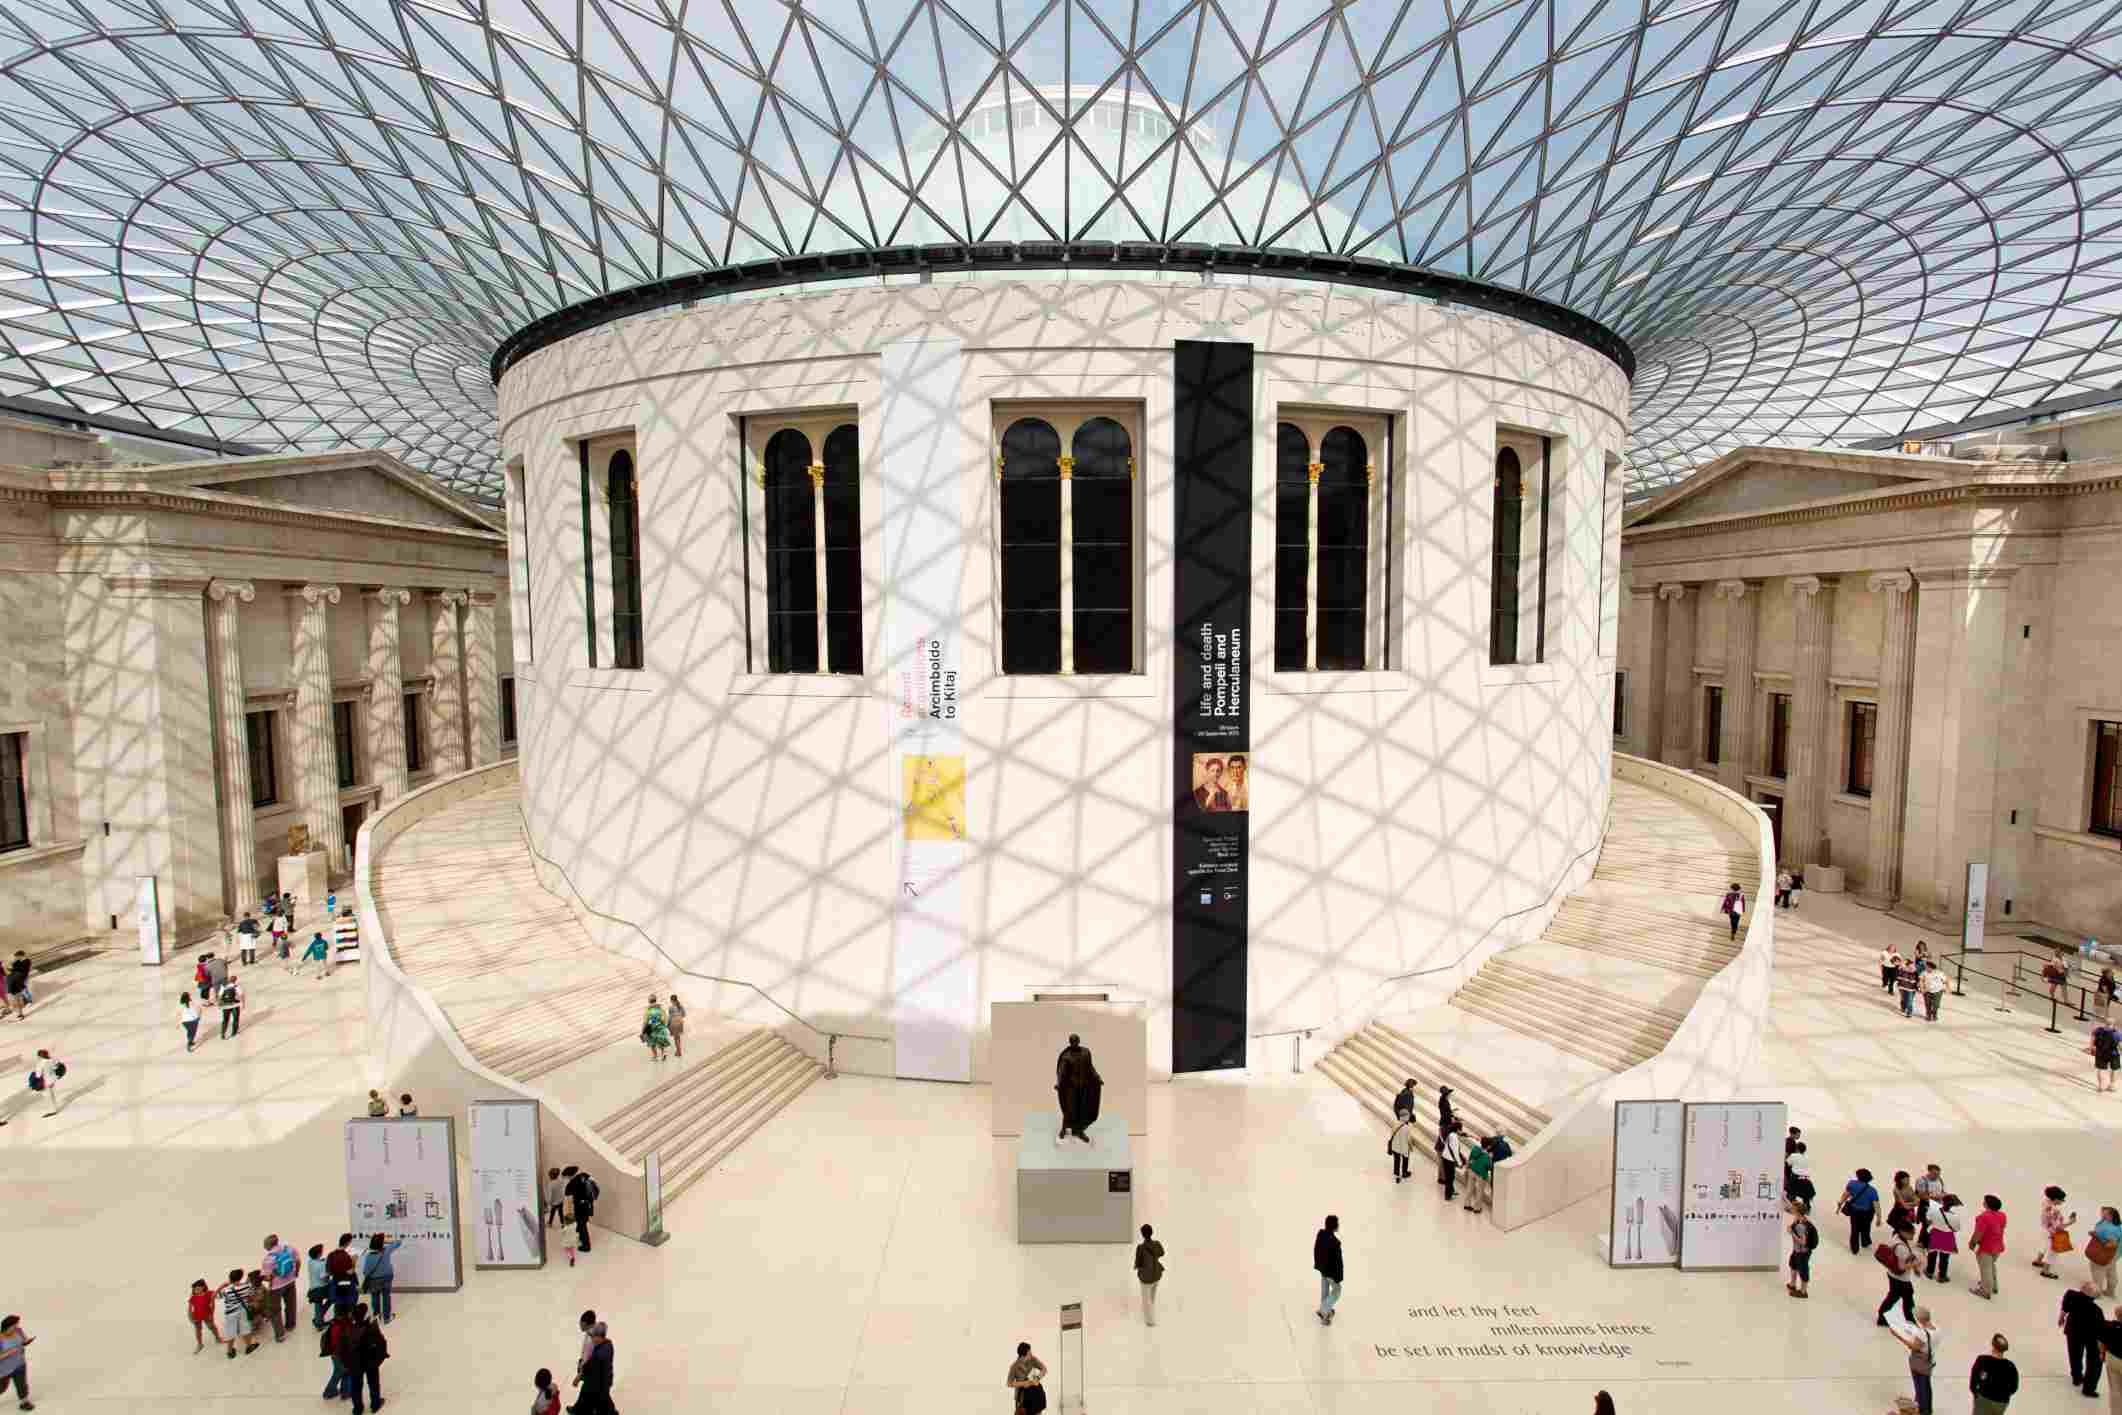 People enjoying the stunning interior of the British Museum